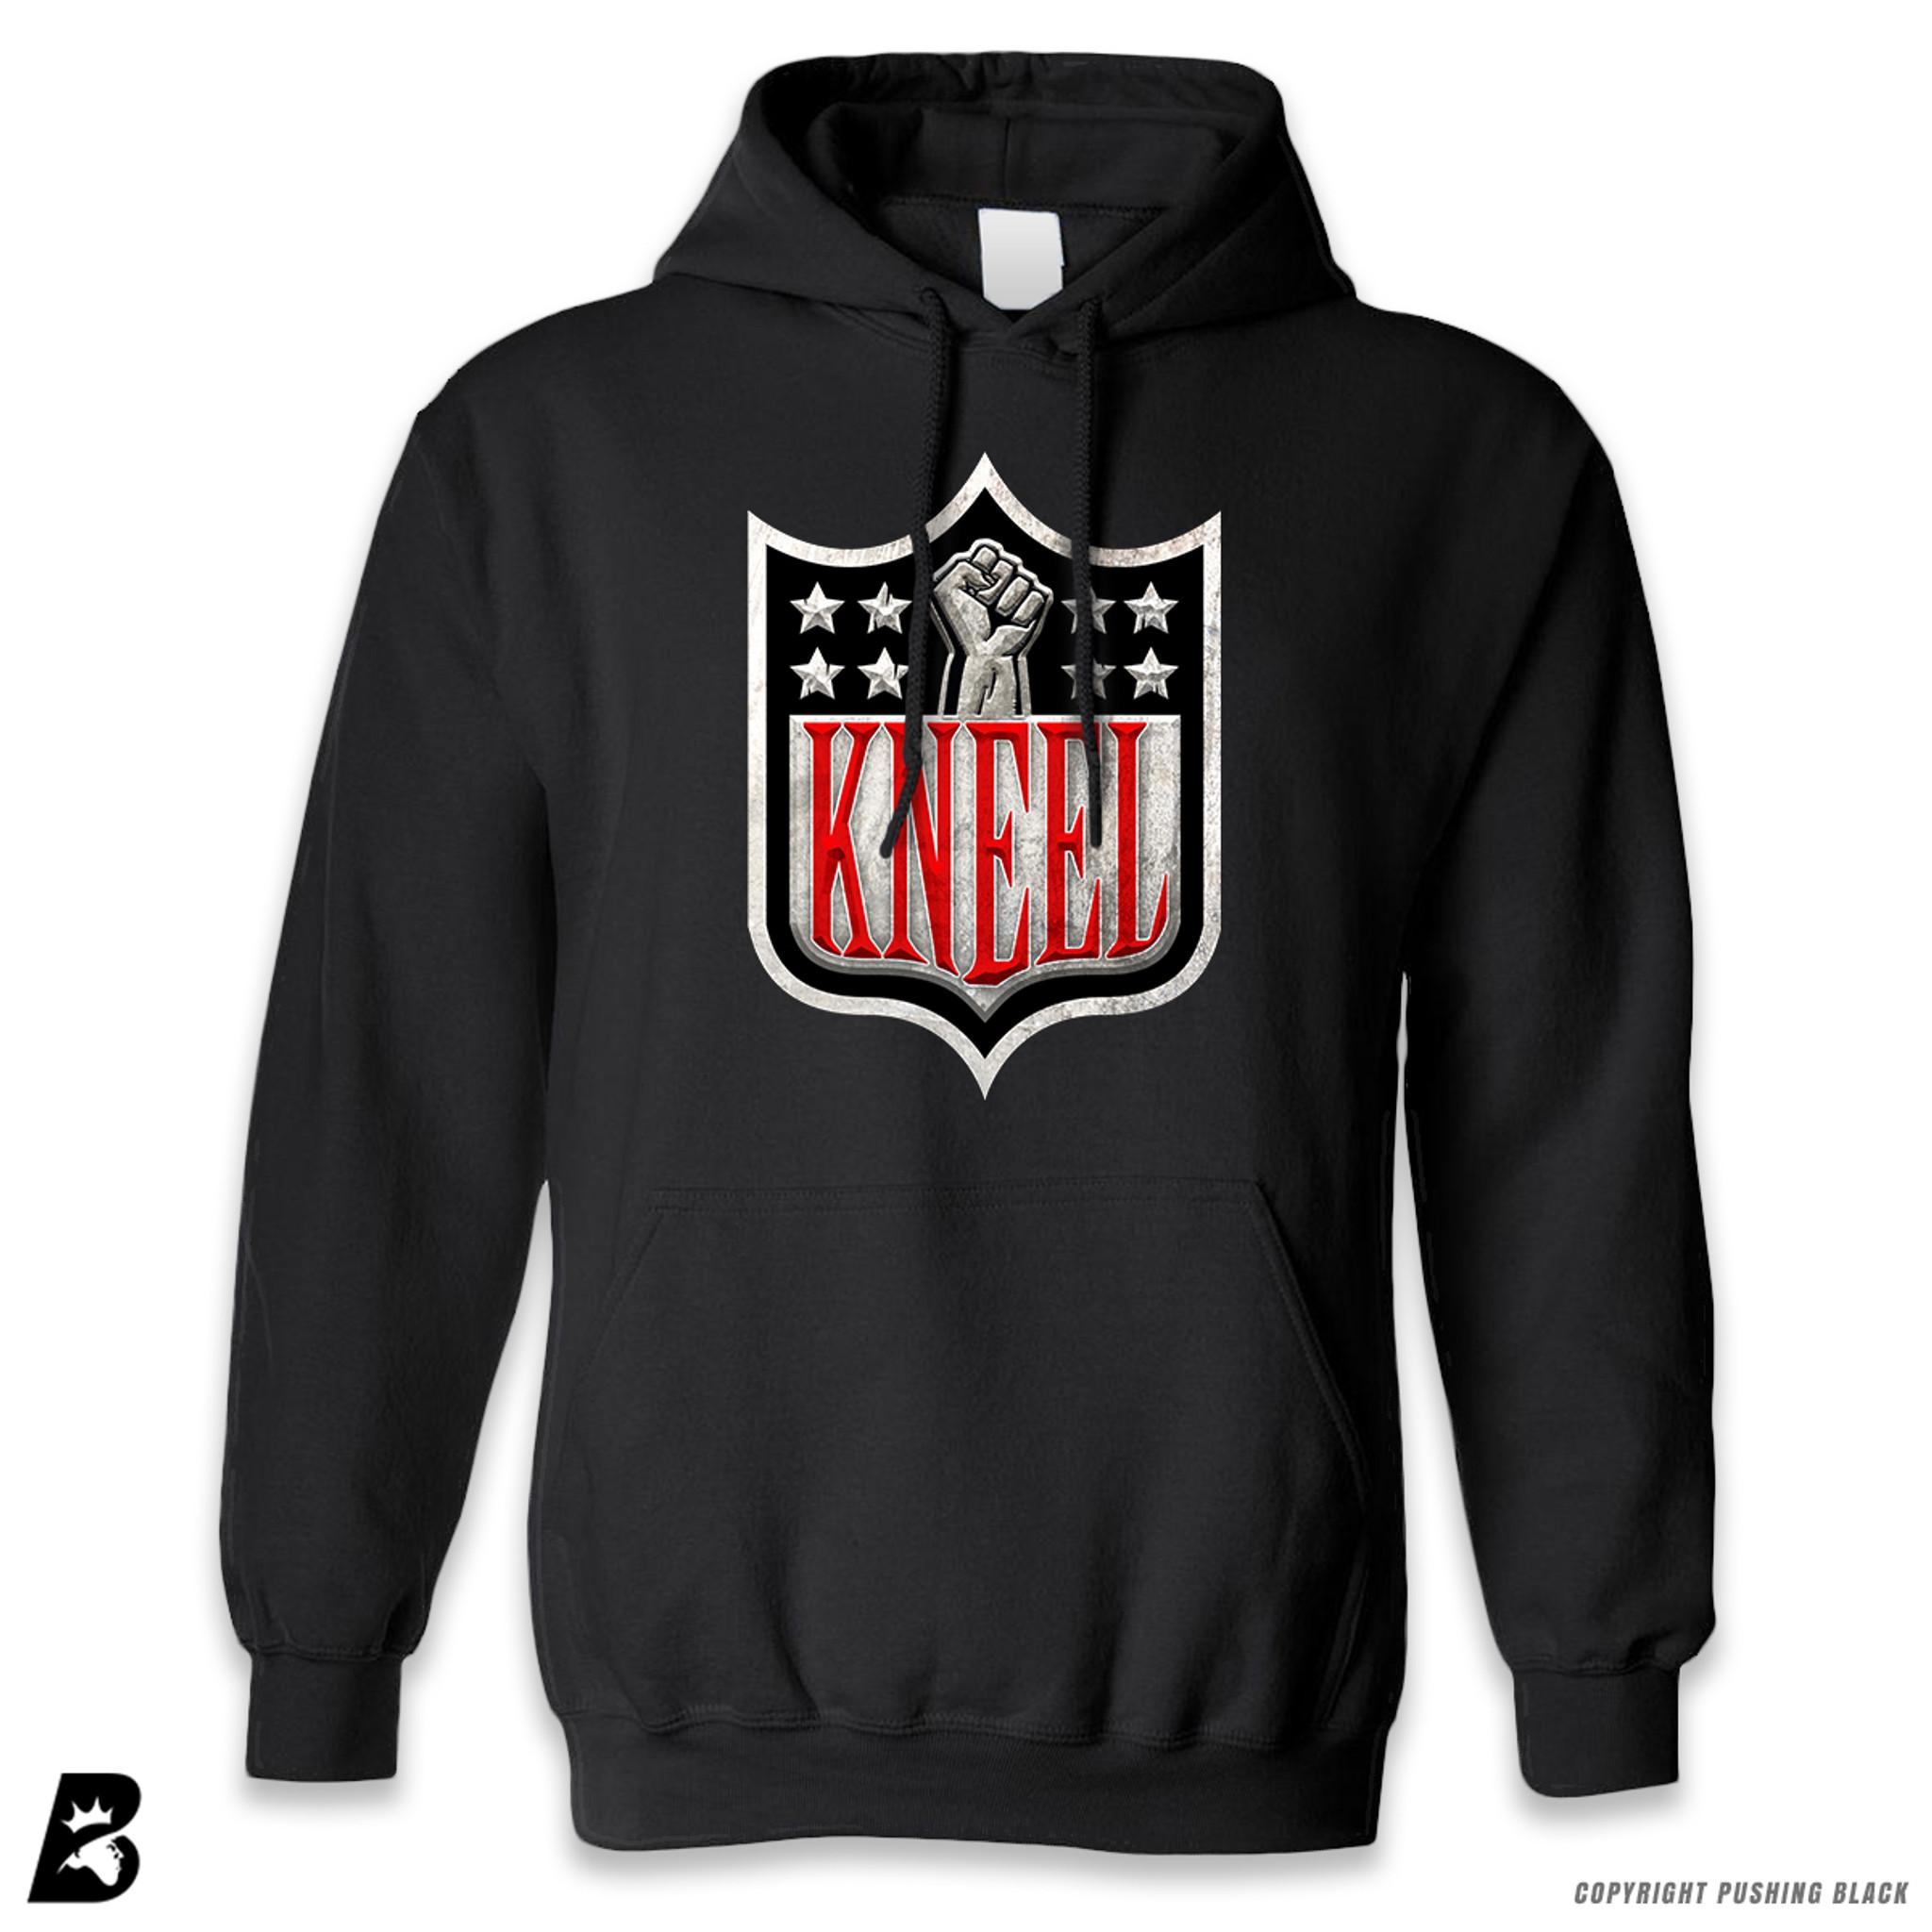 Kneel with Kap Shield Premium Unisex Hoodie with Pocket